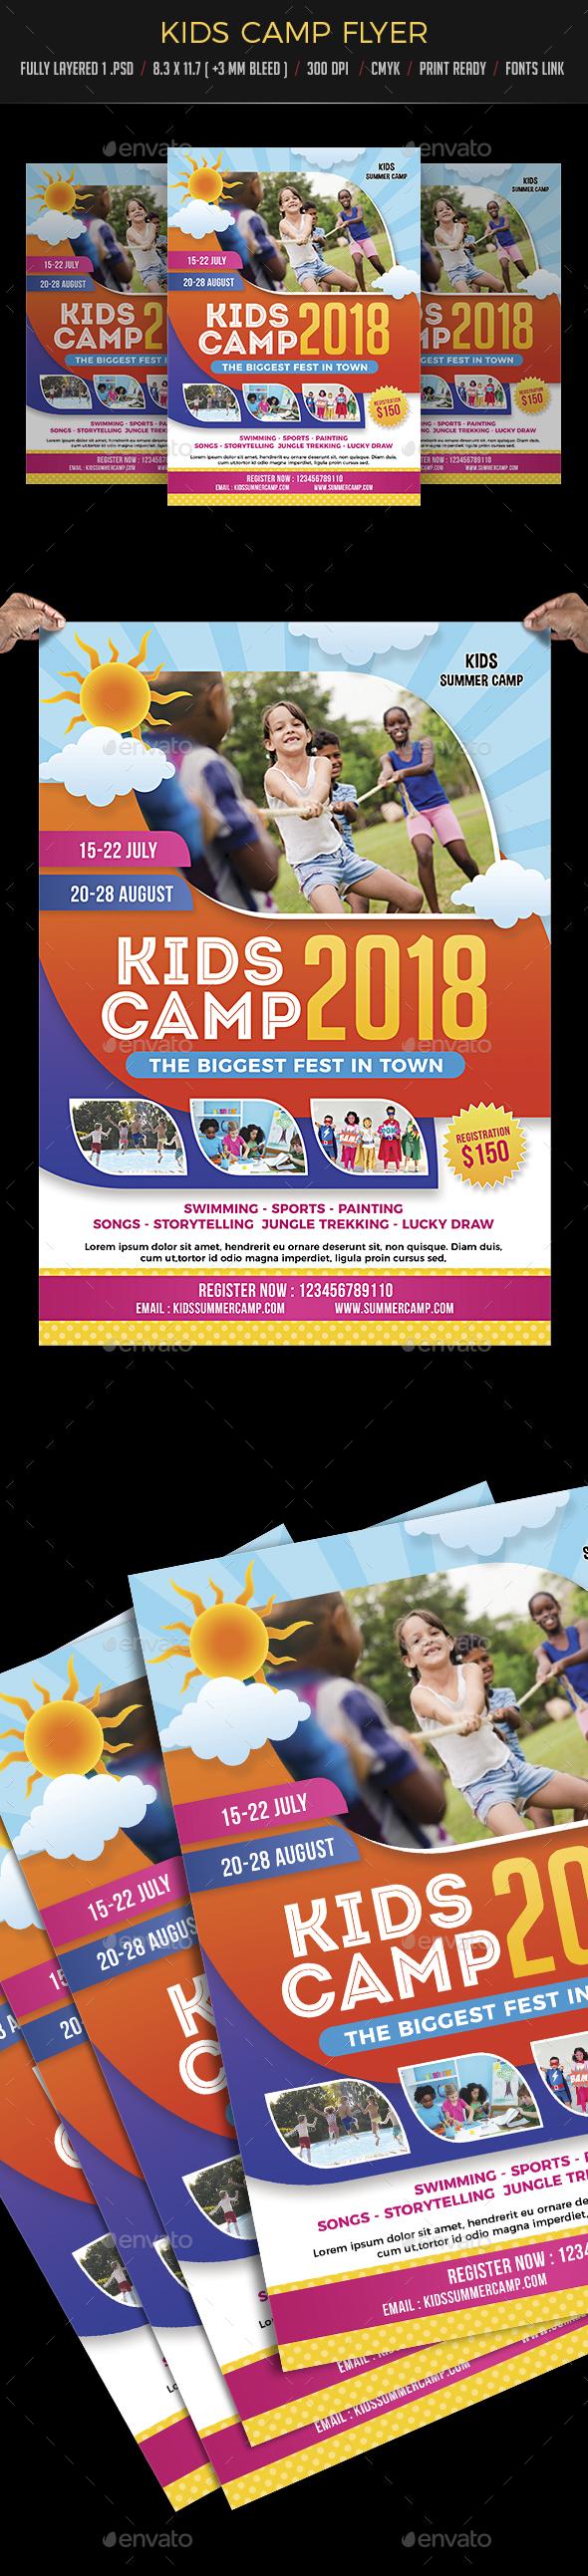 Kids Camp Flyer - Flyers Print Templates